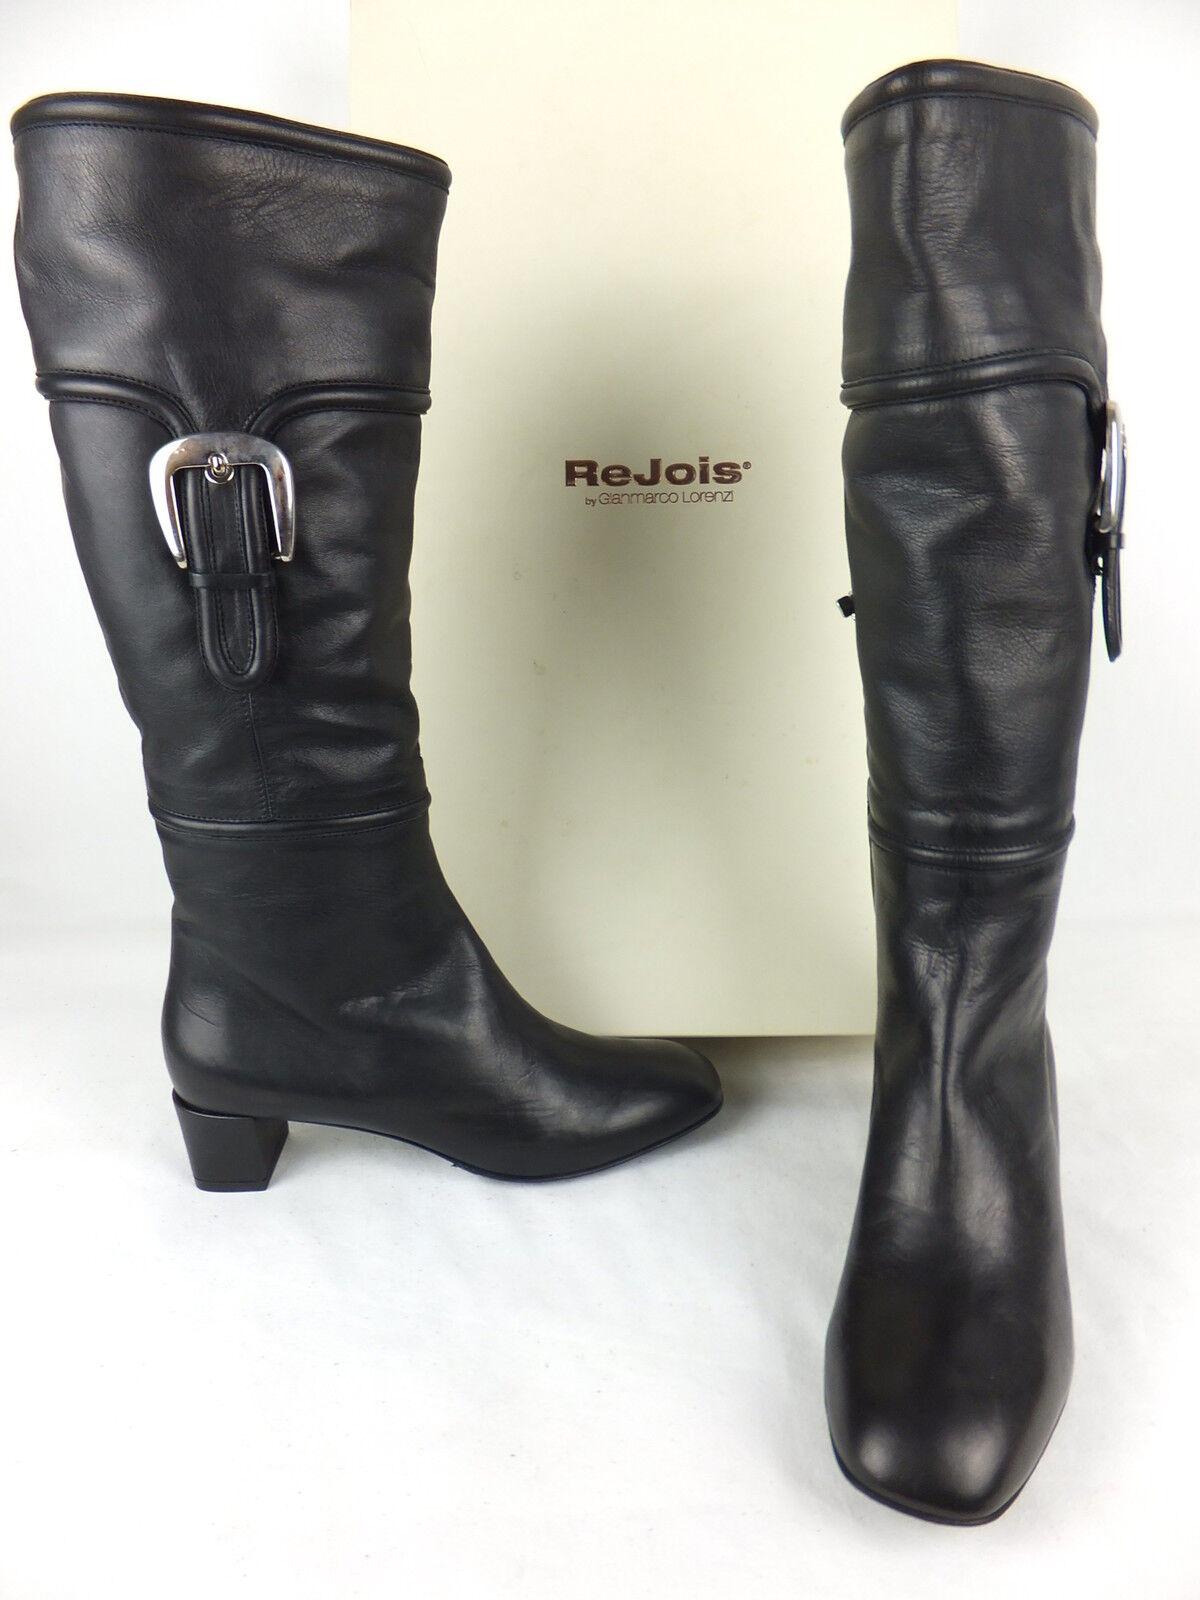 Rejois by Gianmarco Lorenzi Stiefel  - 37 - schwarz  neu m. Karton mit Schnallen